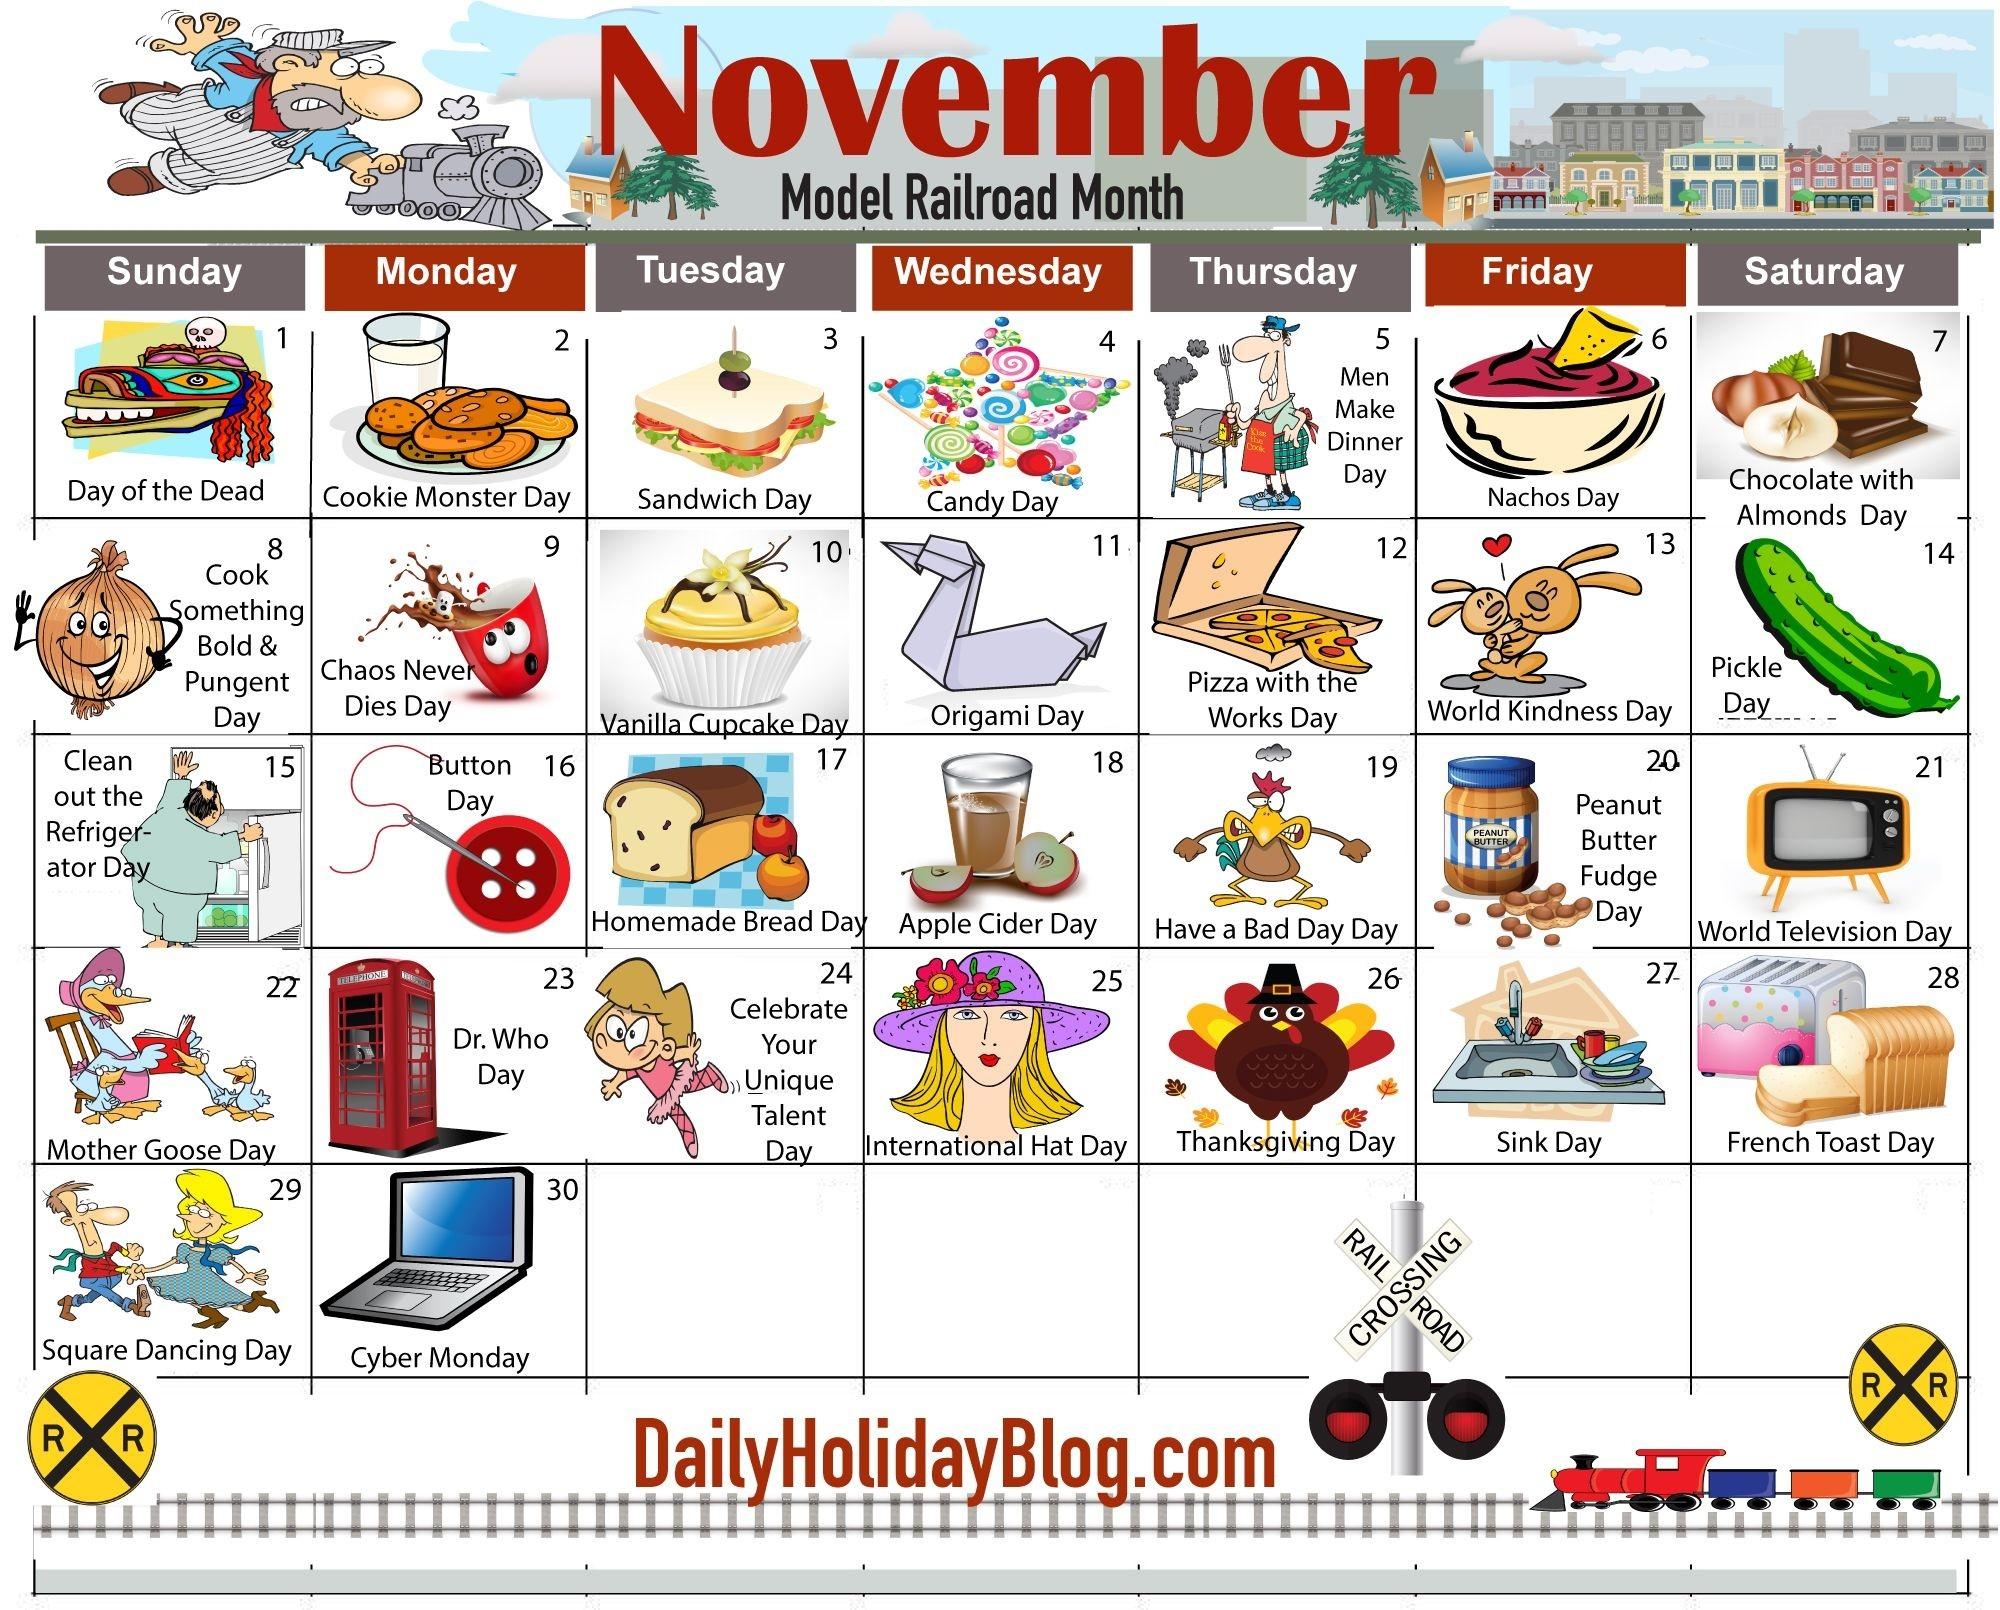 November Daily Holiday Calendar | National Holiday Calendar-September 2020 Daily Holidays Special And Wacky Days